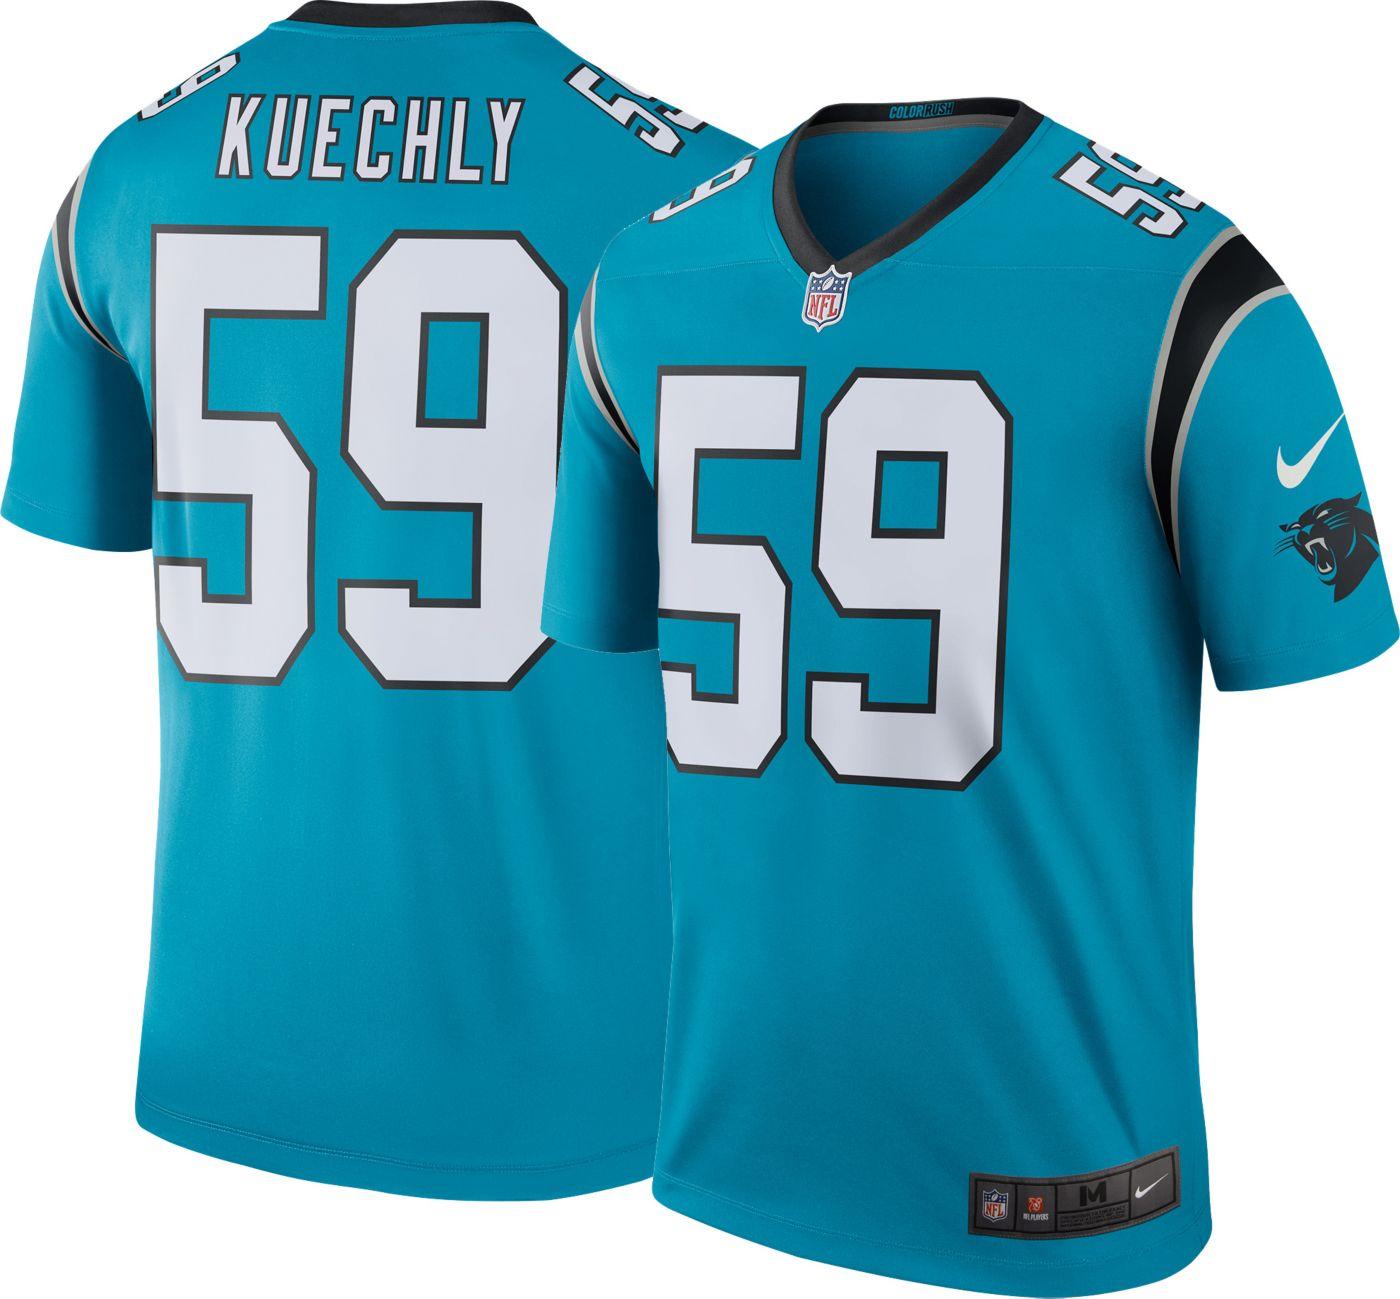 Nike Men's Color Rush Carolina Panthers Luke Kuechly #59 Legend Jersey